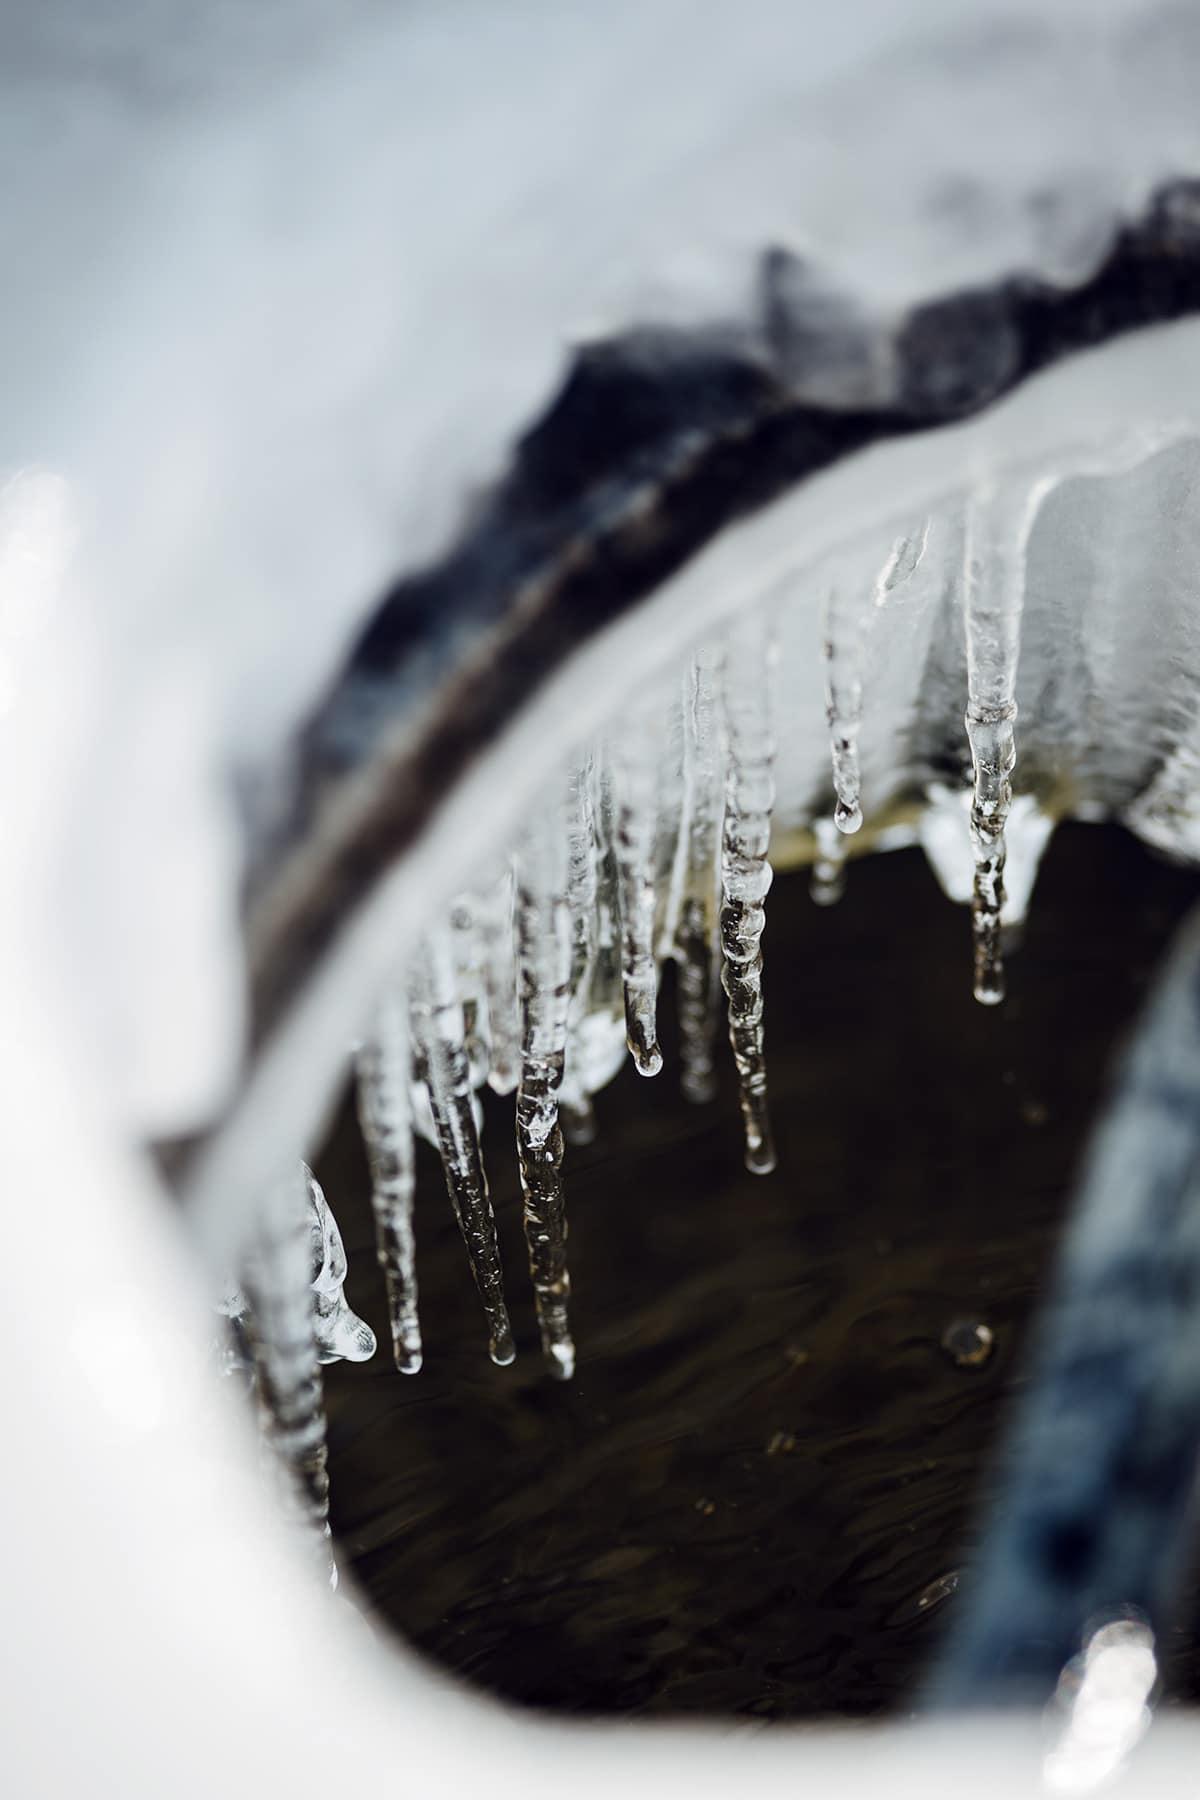 Fontaine gelée, février 2021